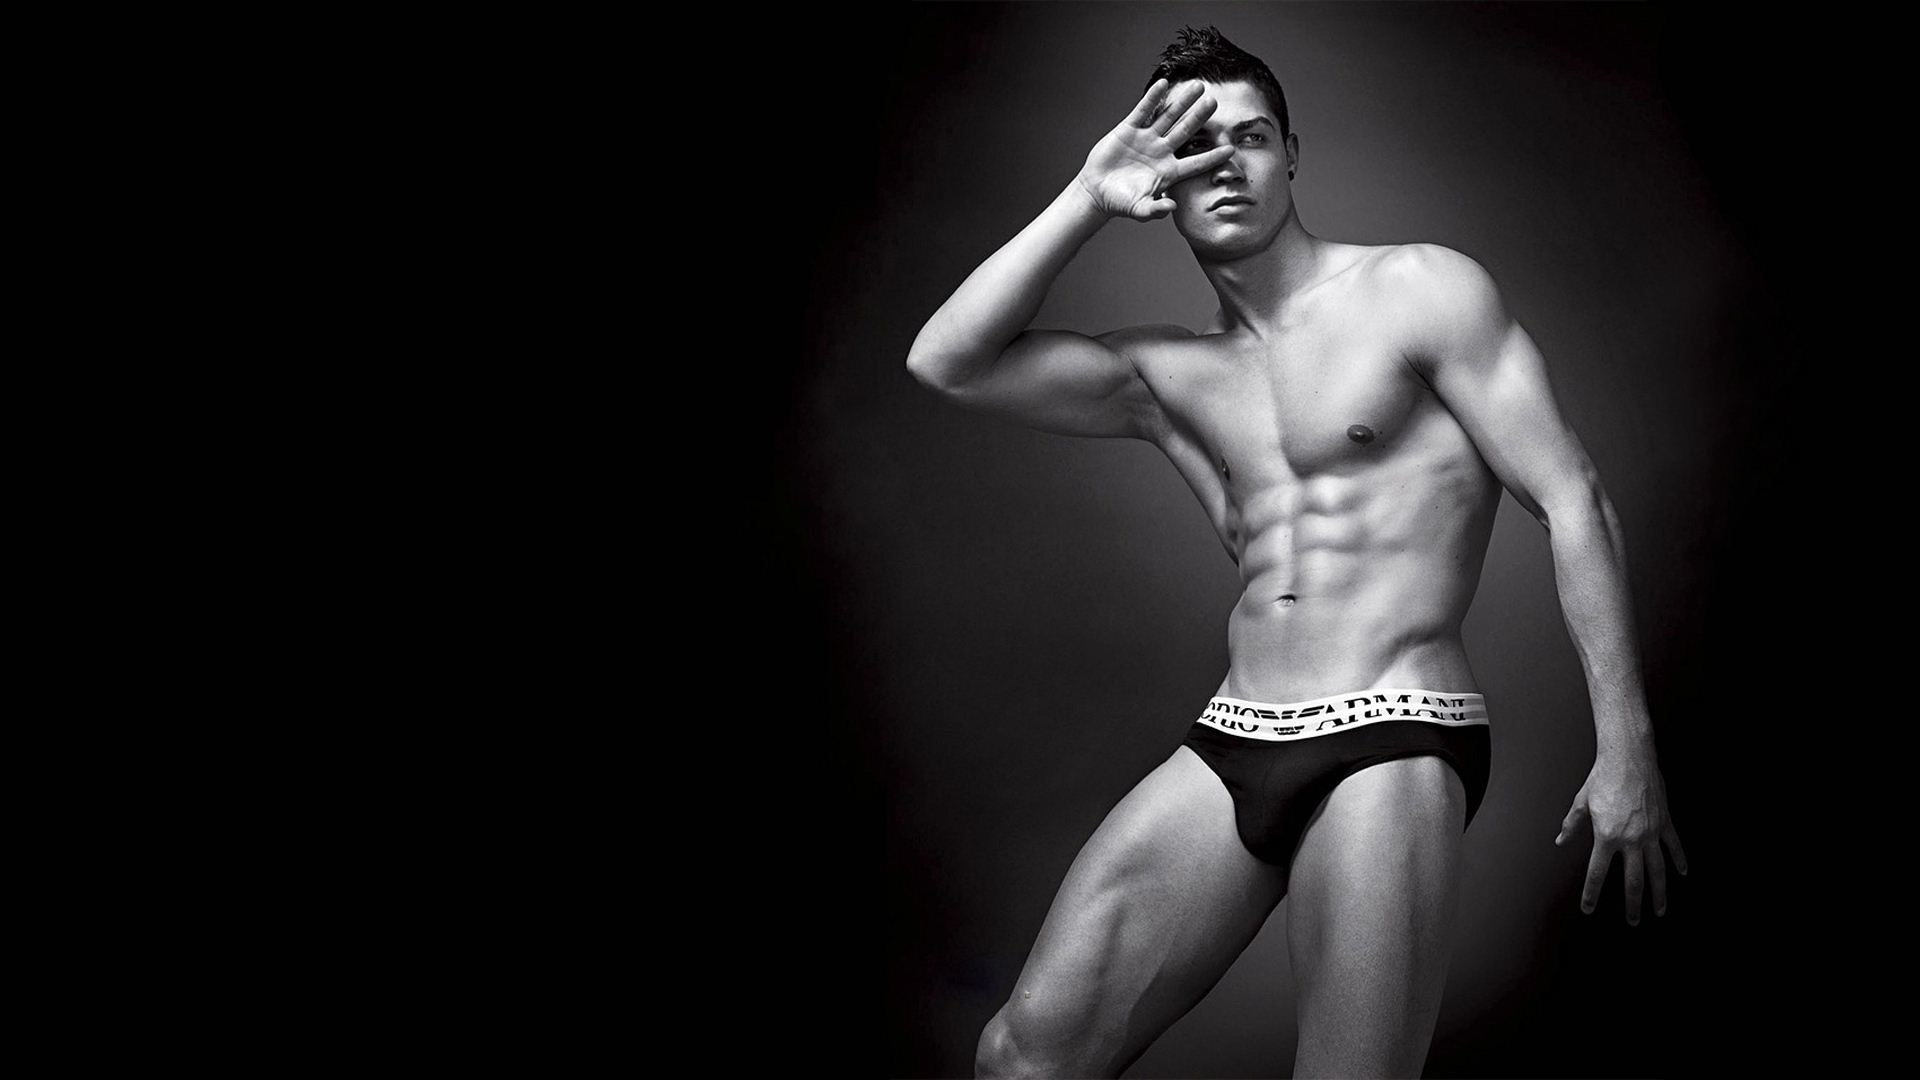 Hot naked Cristiano Ronaldo Armani wallpaper